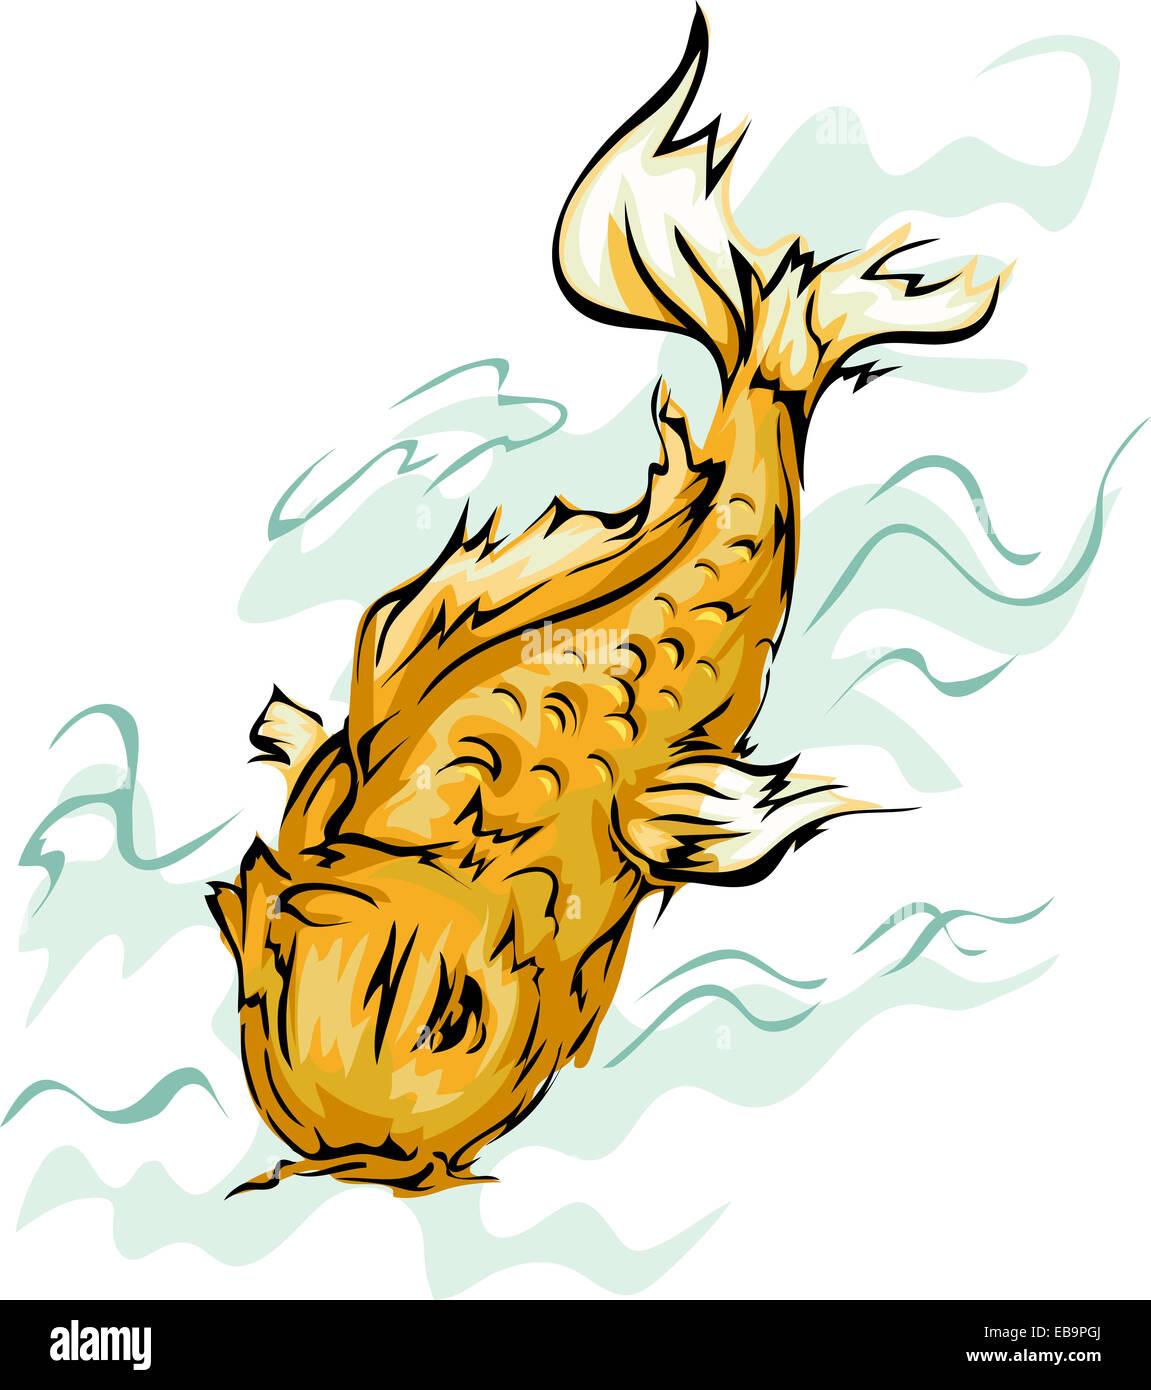 Koi Fish Illustration Stock Photos & Koi Fish Illustration Stock ...